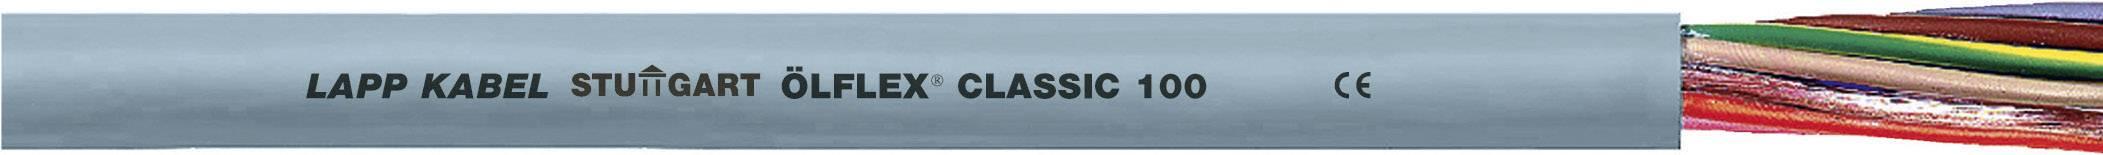 Kabel LappKabel Ölflex CLASSIC 100 7G4 (0010103), PVC, 15,2 mm, 750 V, šedá, 50 m